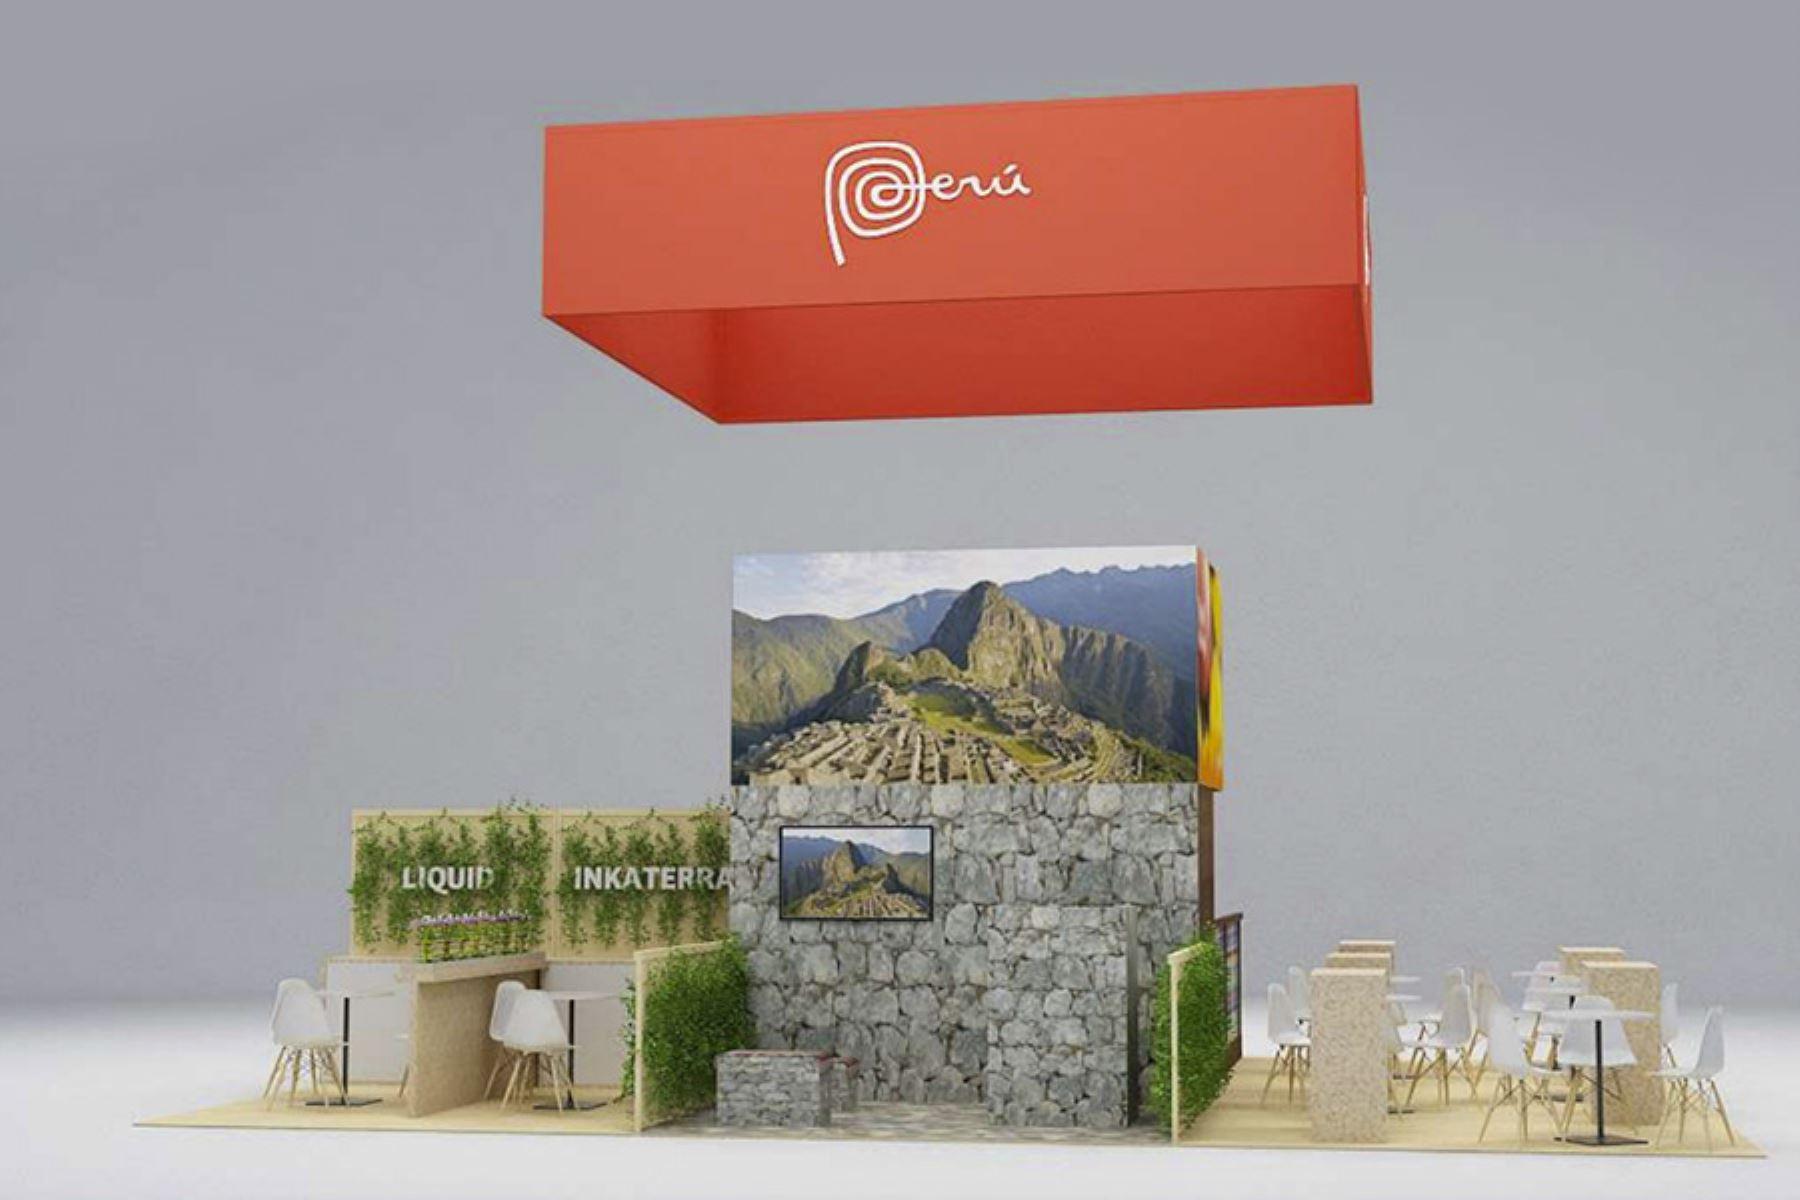 Promperú tendrá un stand en el Trade Show del SXSW. Foto: Marca Perú